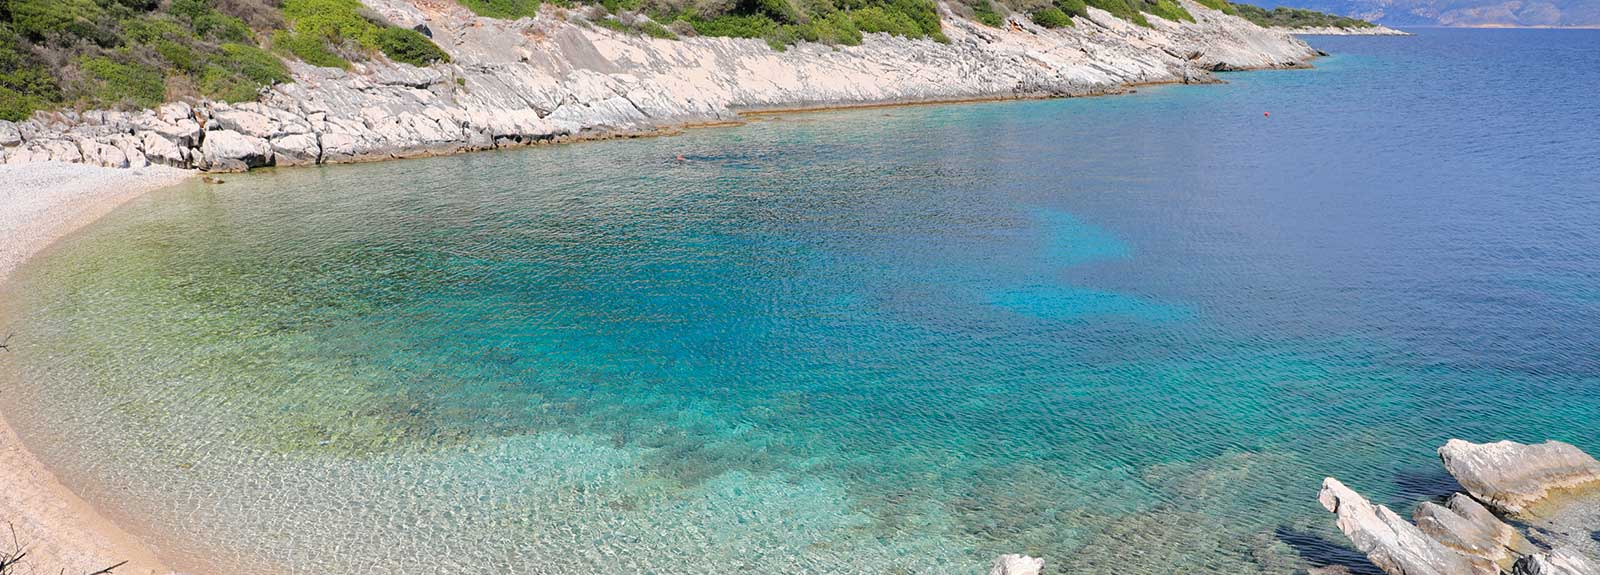 slider_home_Grecia_10.jpg